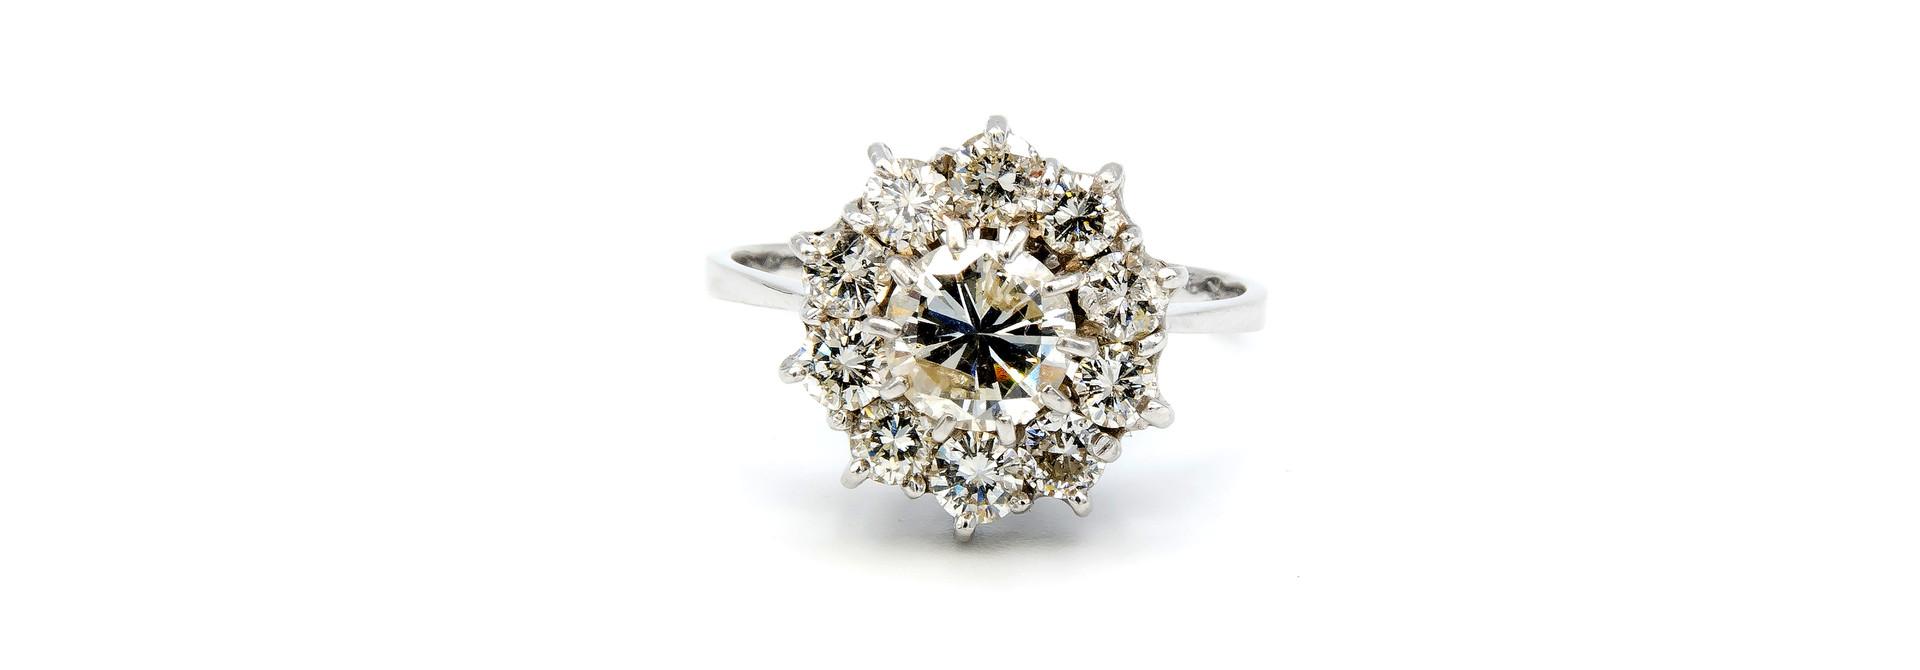 Ring verlovingsring grote synthetische diamant omringd door 10 lager ingezette diamanten witgoud